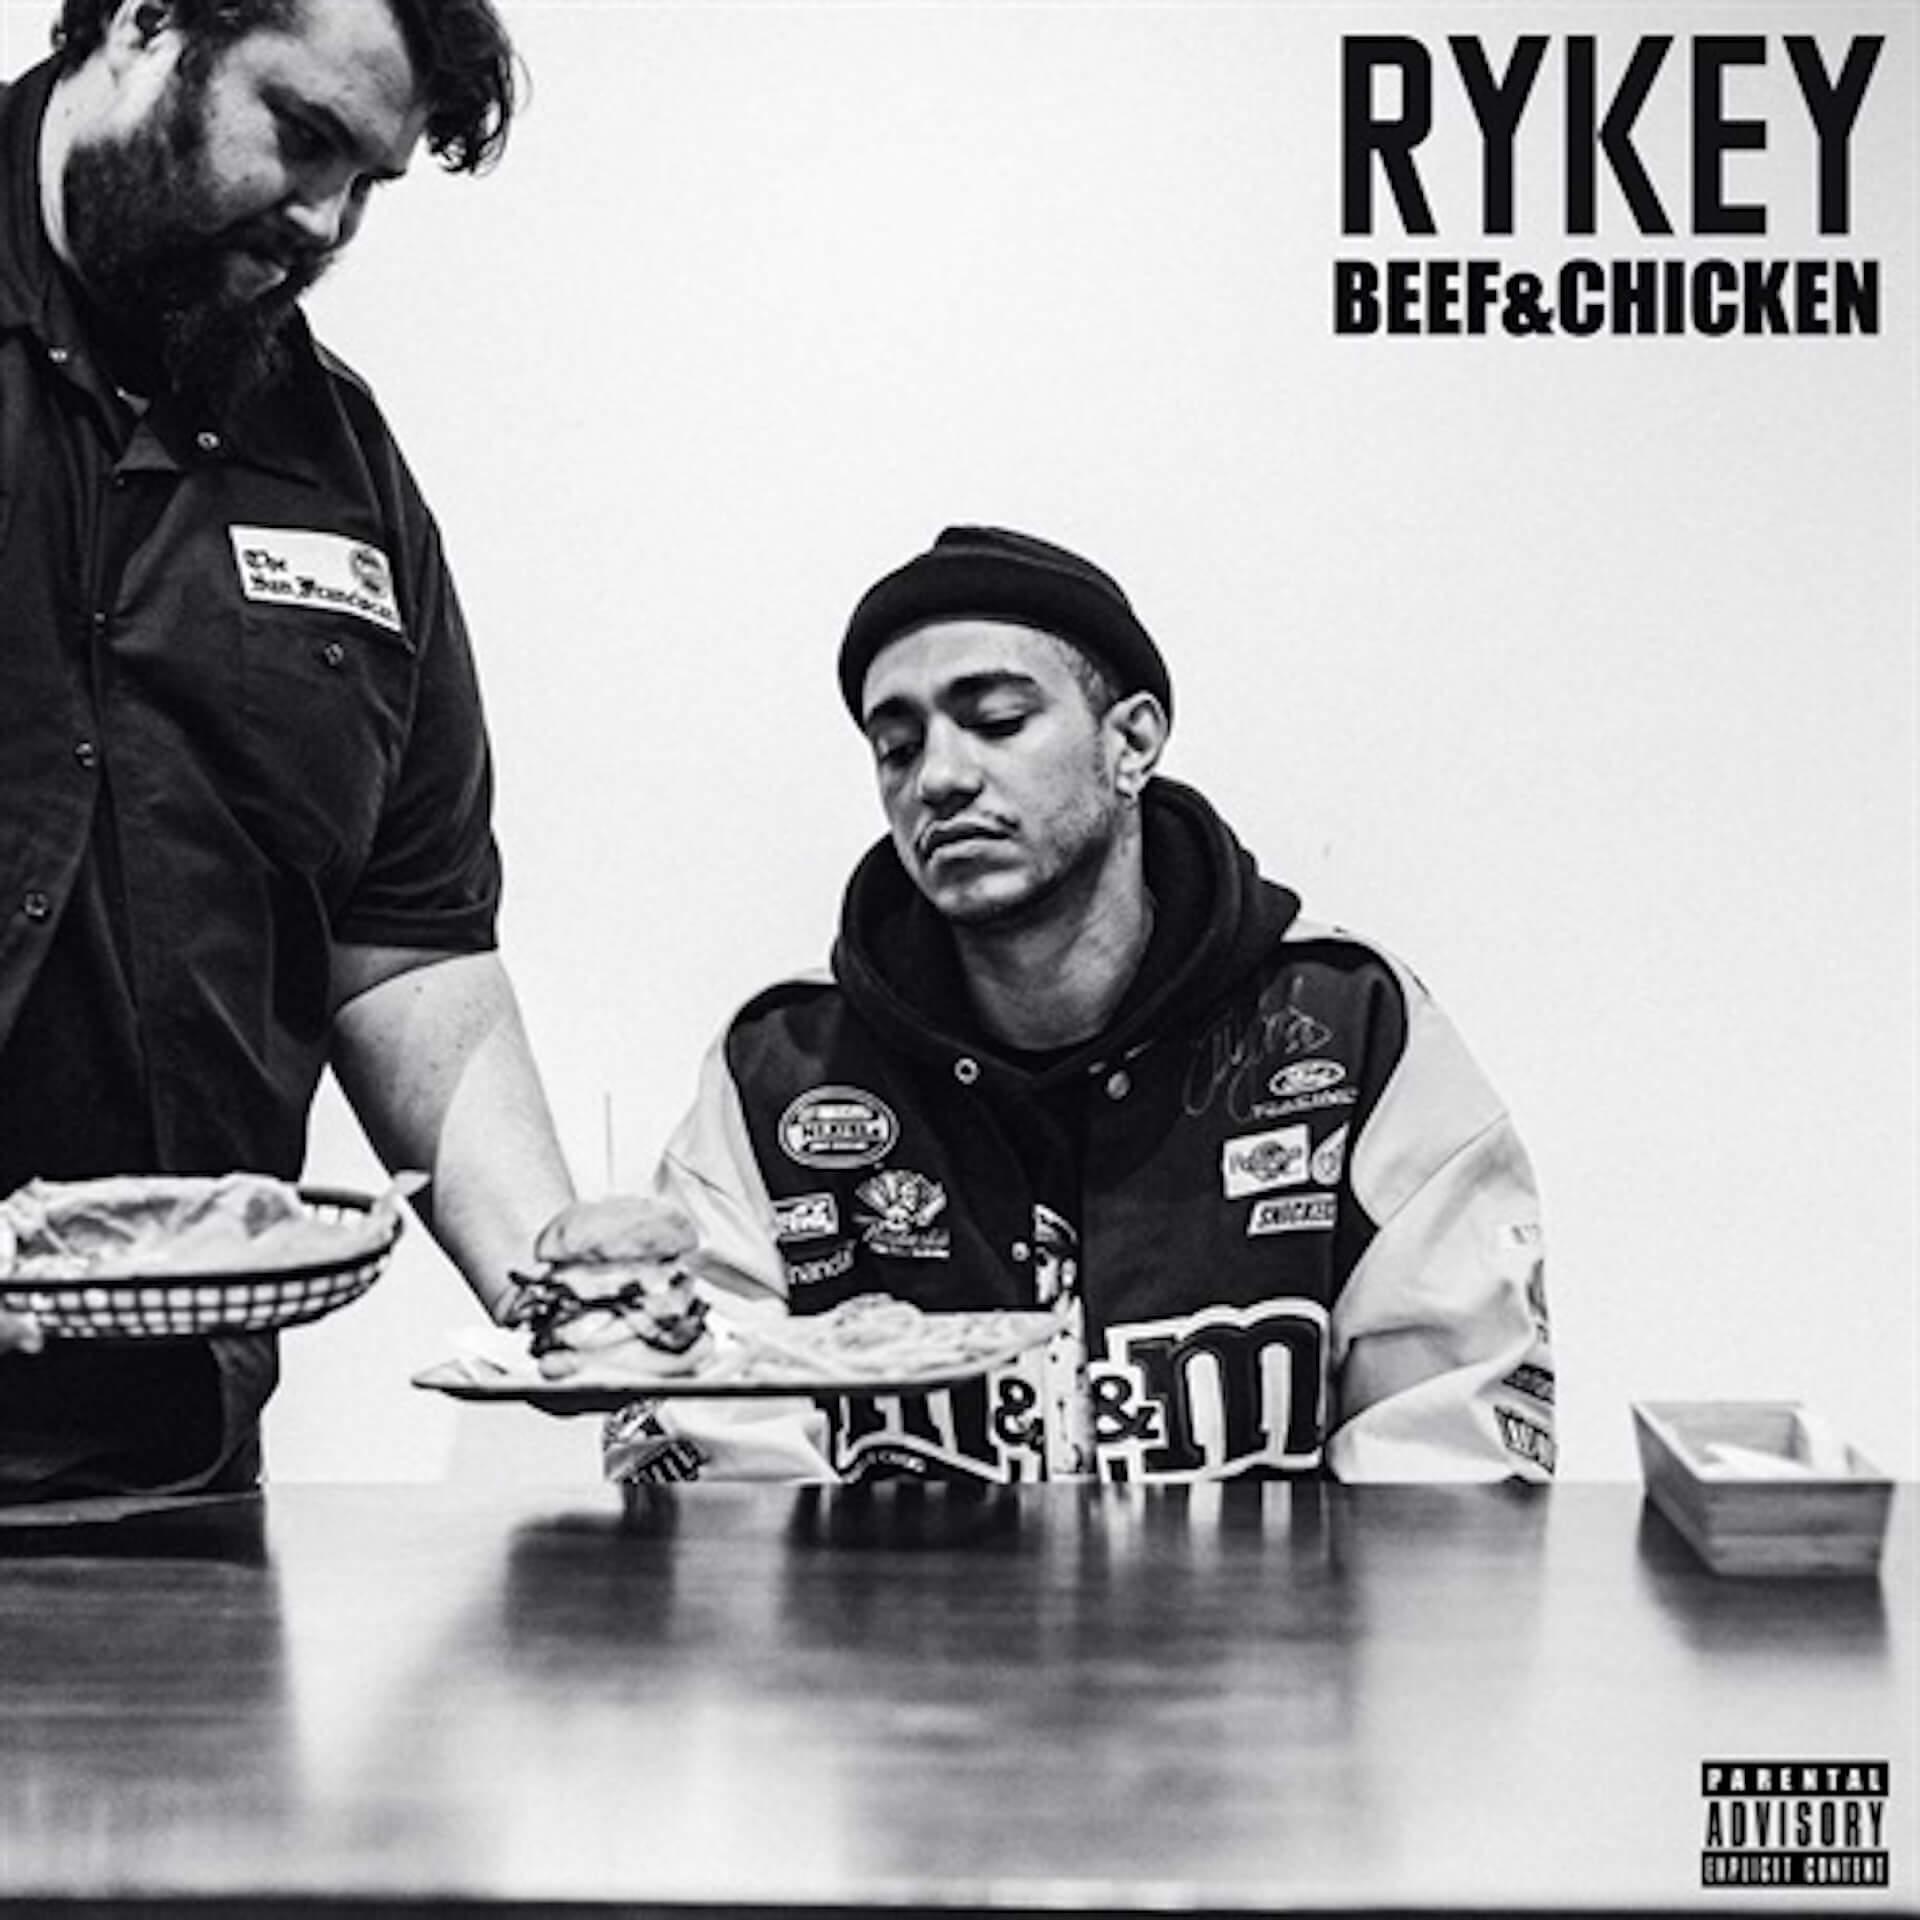 RYKEY、6月発売予定のAL『BEEF&CHICKEN』から新曲「Garage」のMV公開 アルバムにはGRADIS NICE、GREEN ASSASSIN DOLLER、LORD 8ERZら music200501-rykey-1